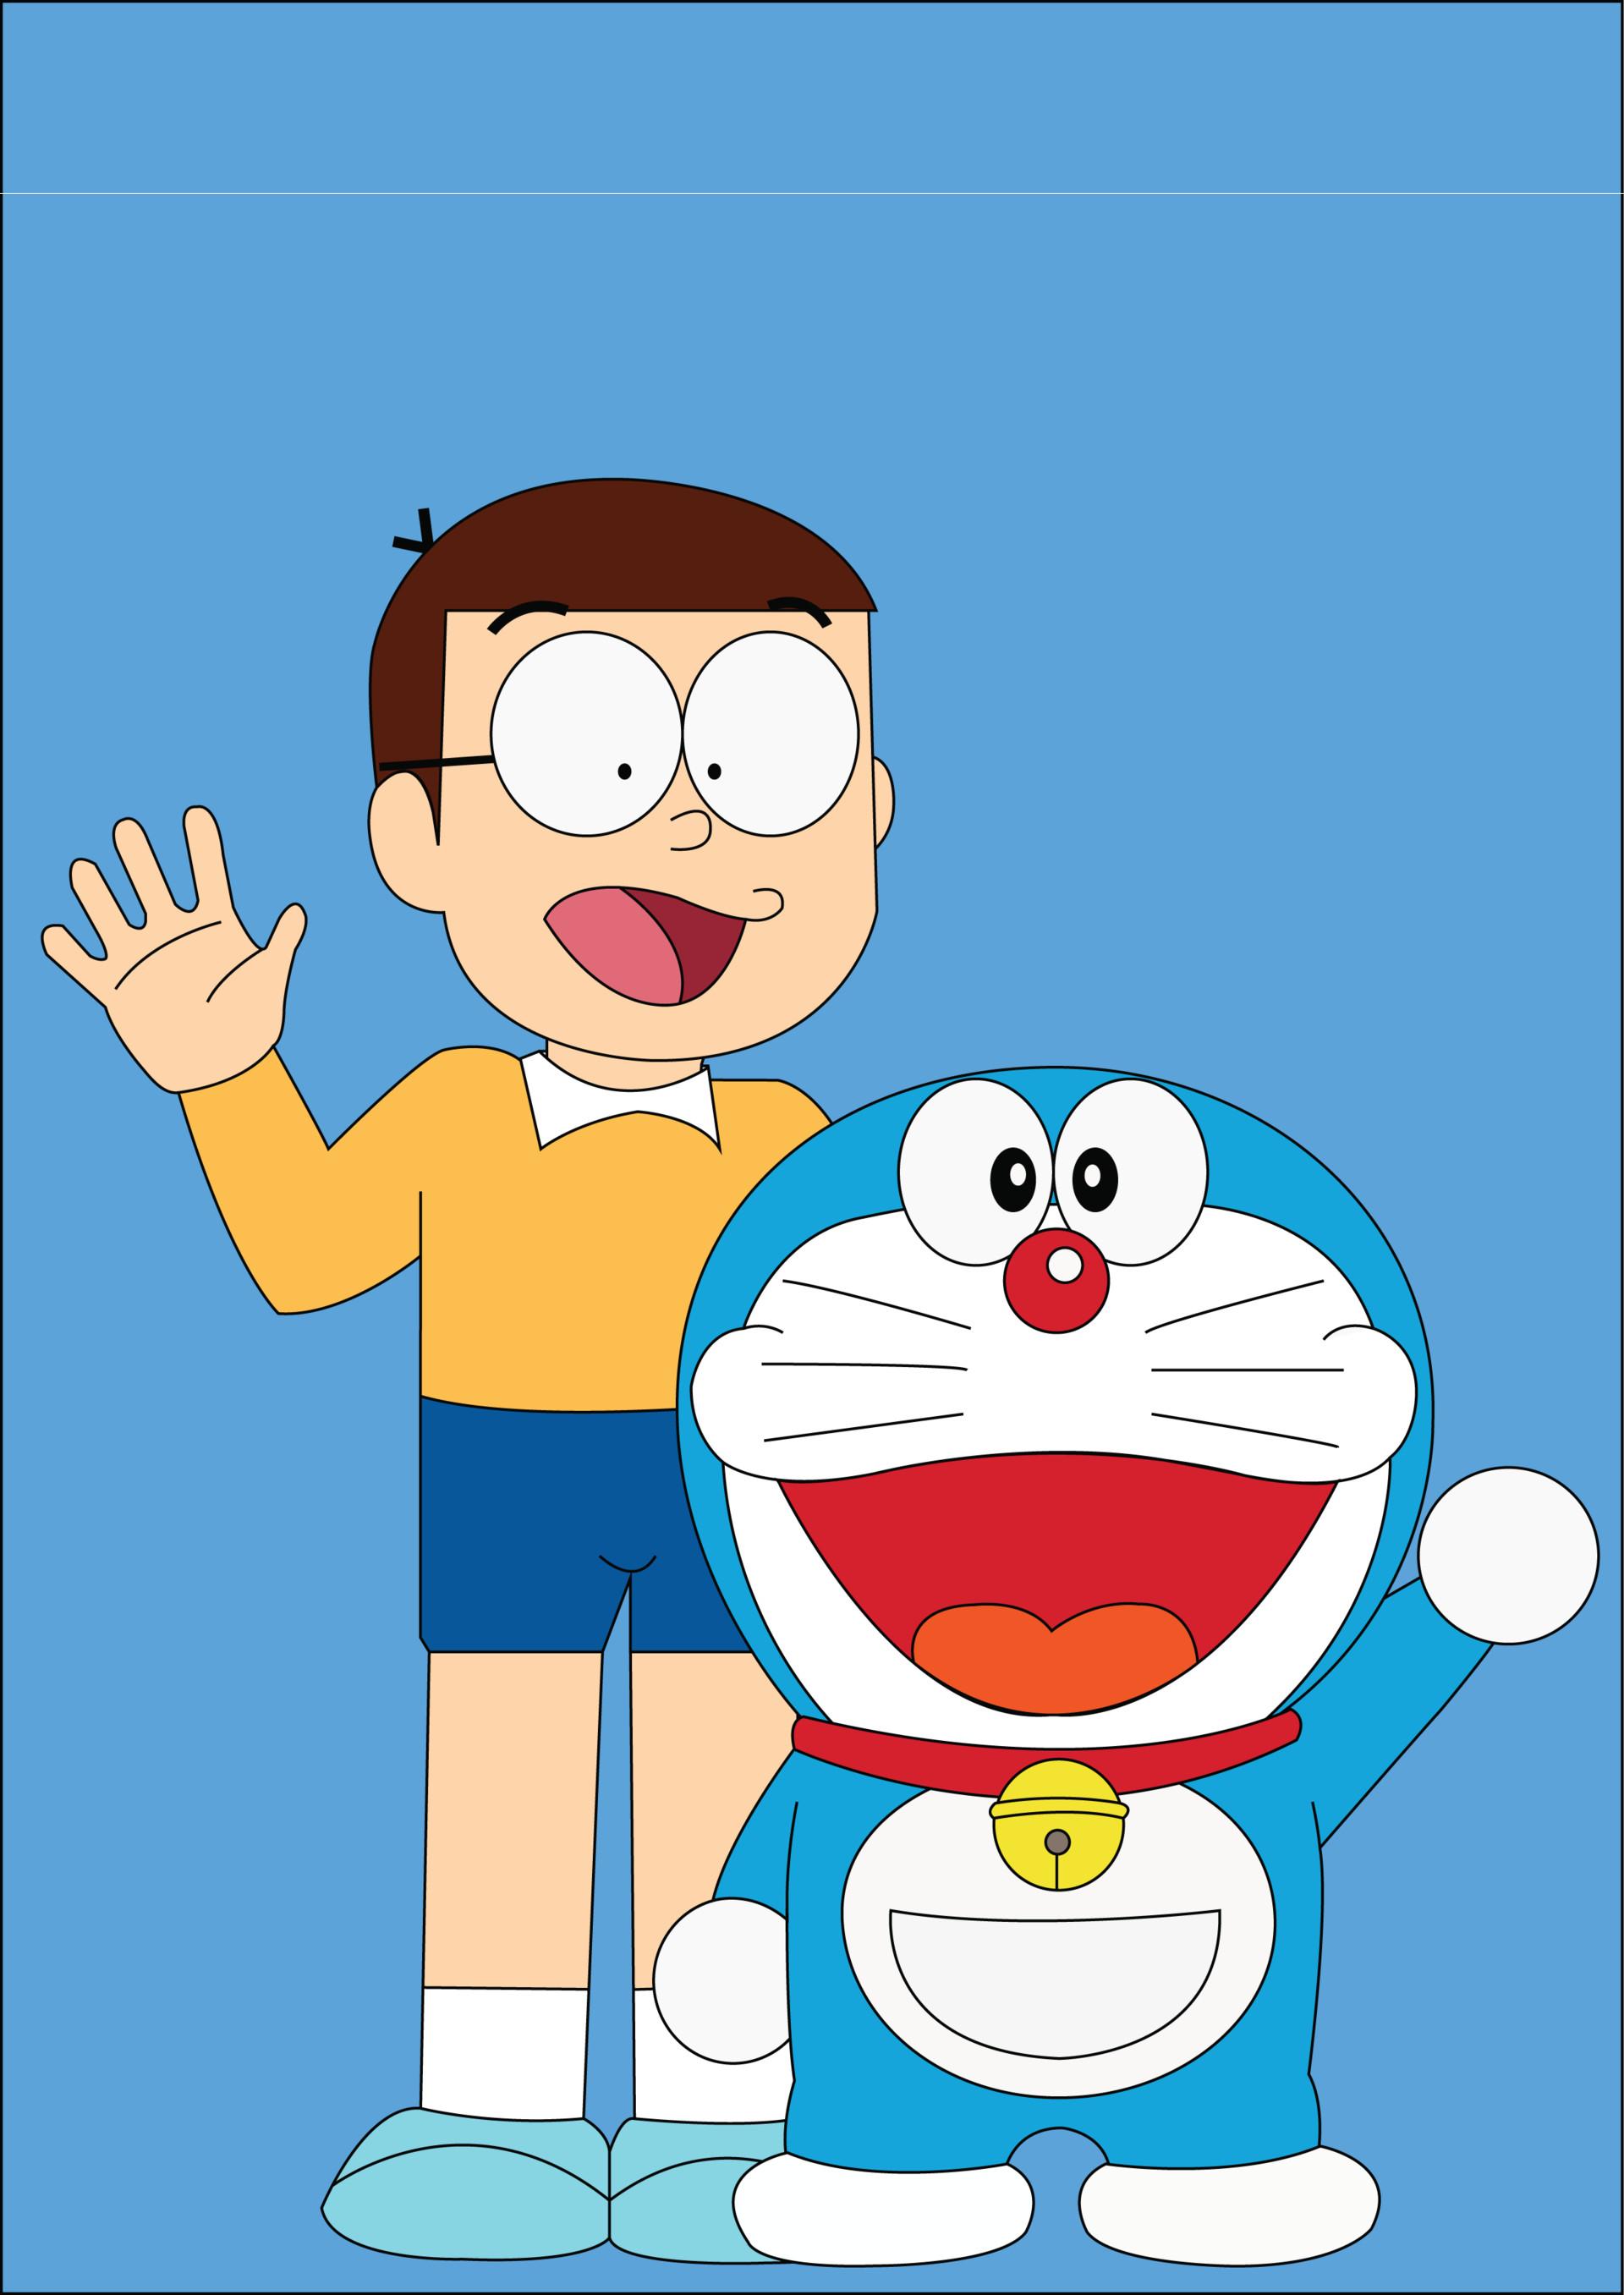 Doraemon Images - Wallpaperall